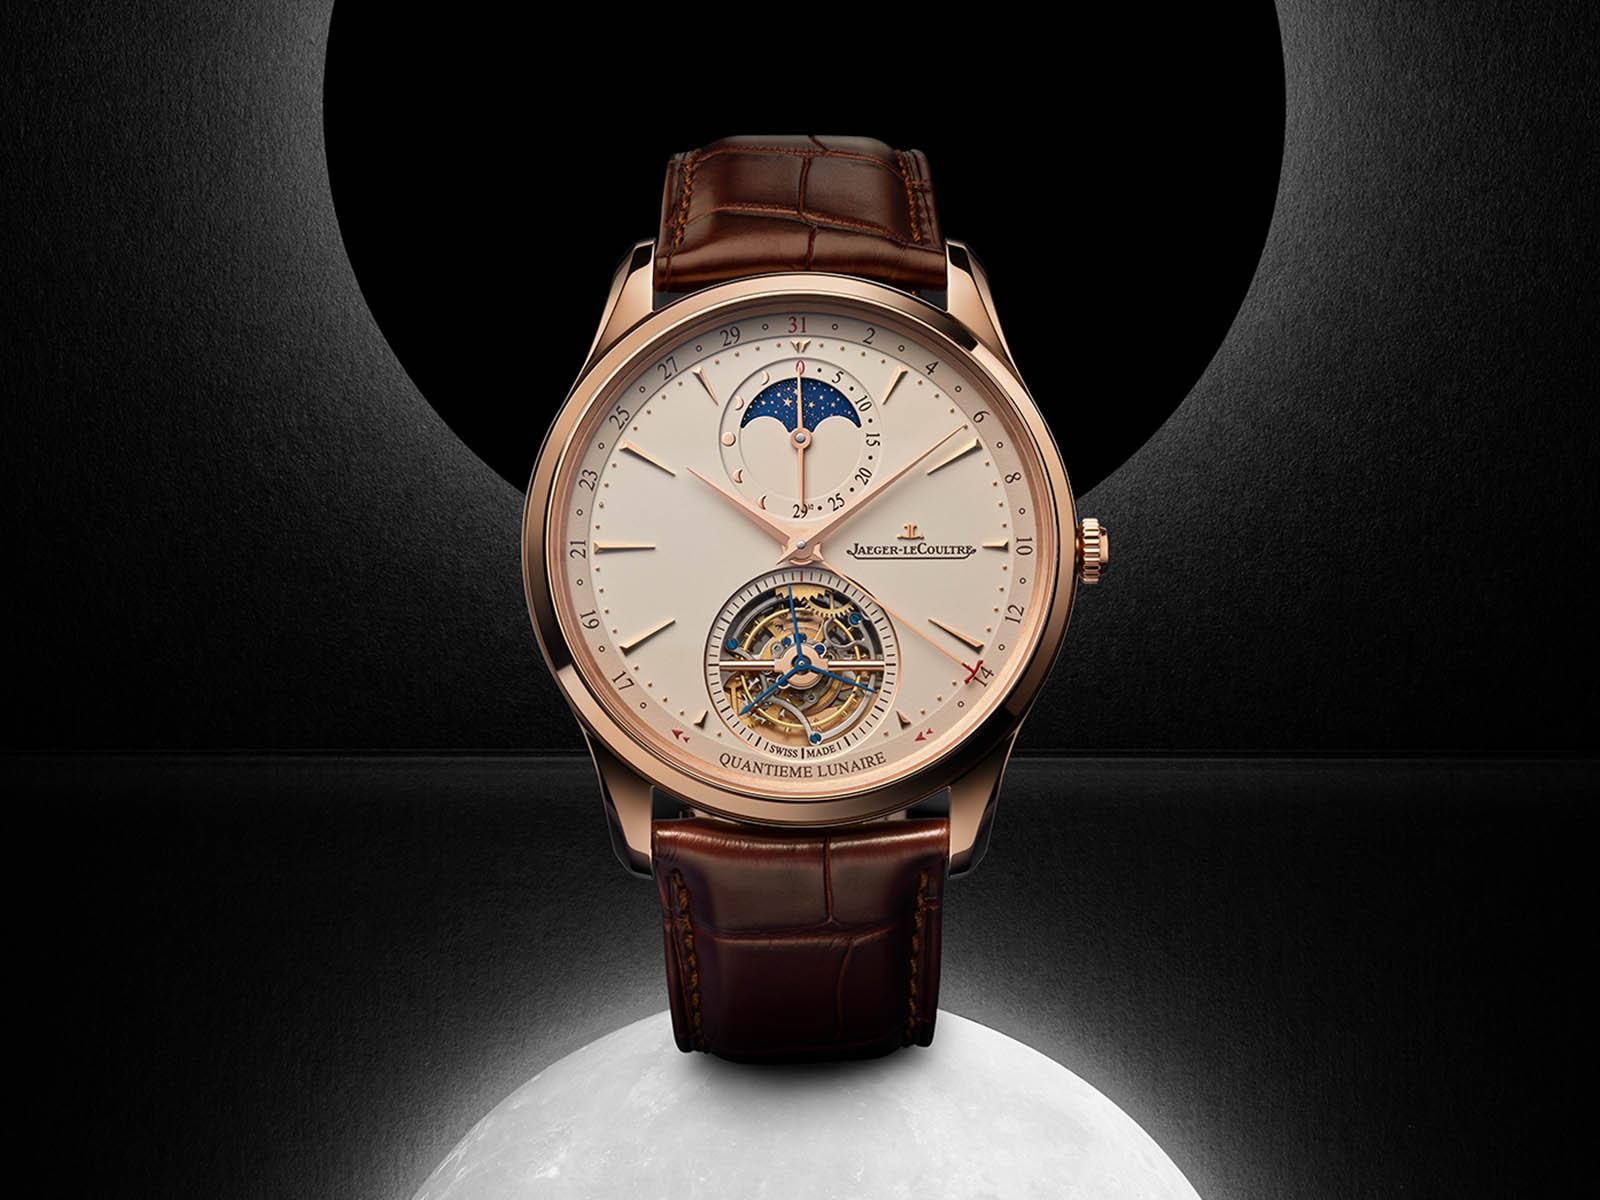 q1692410-jaeger-lecoultre-master-ultra-thin-tourbillon-moon-3.jpg